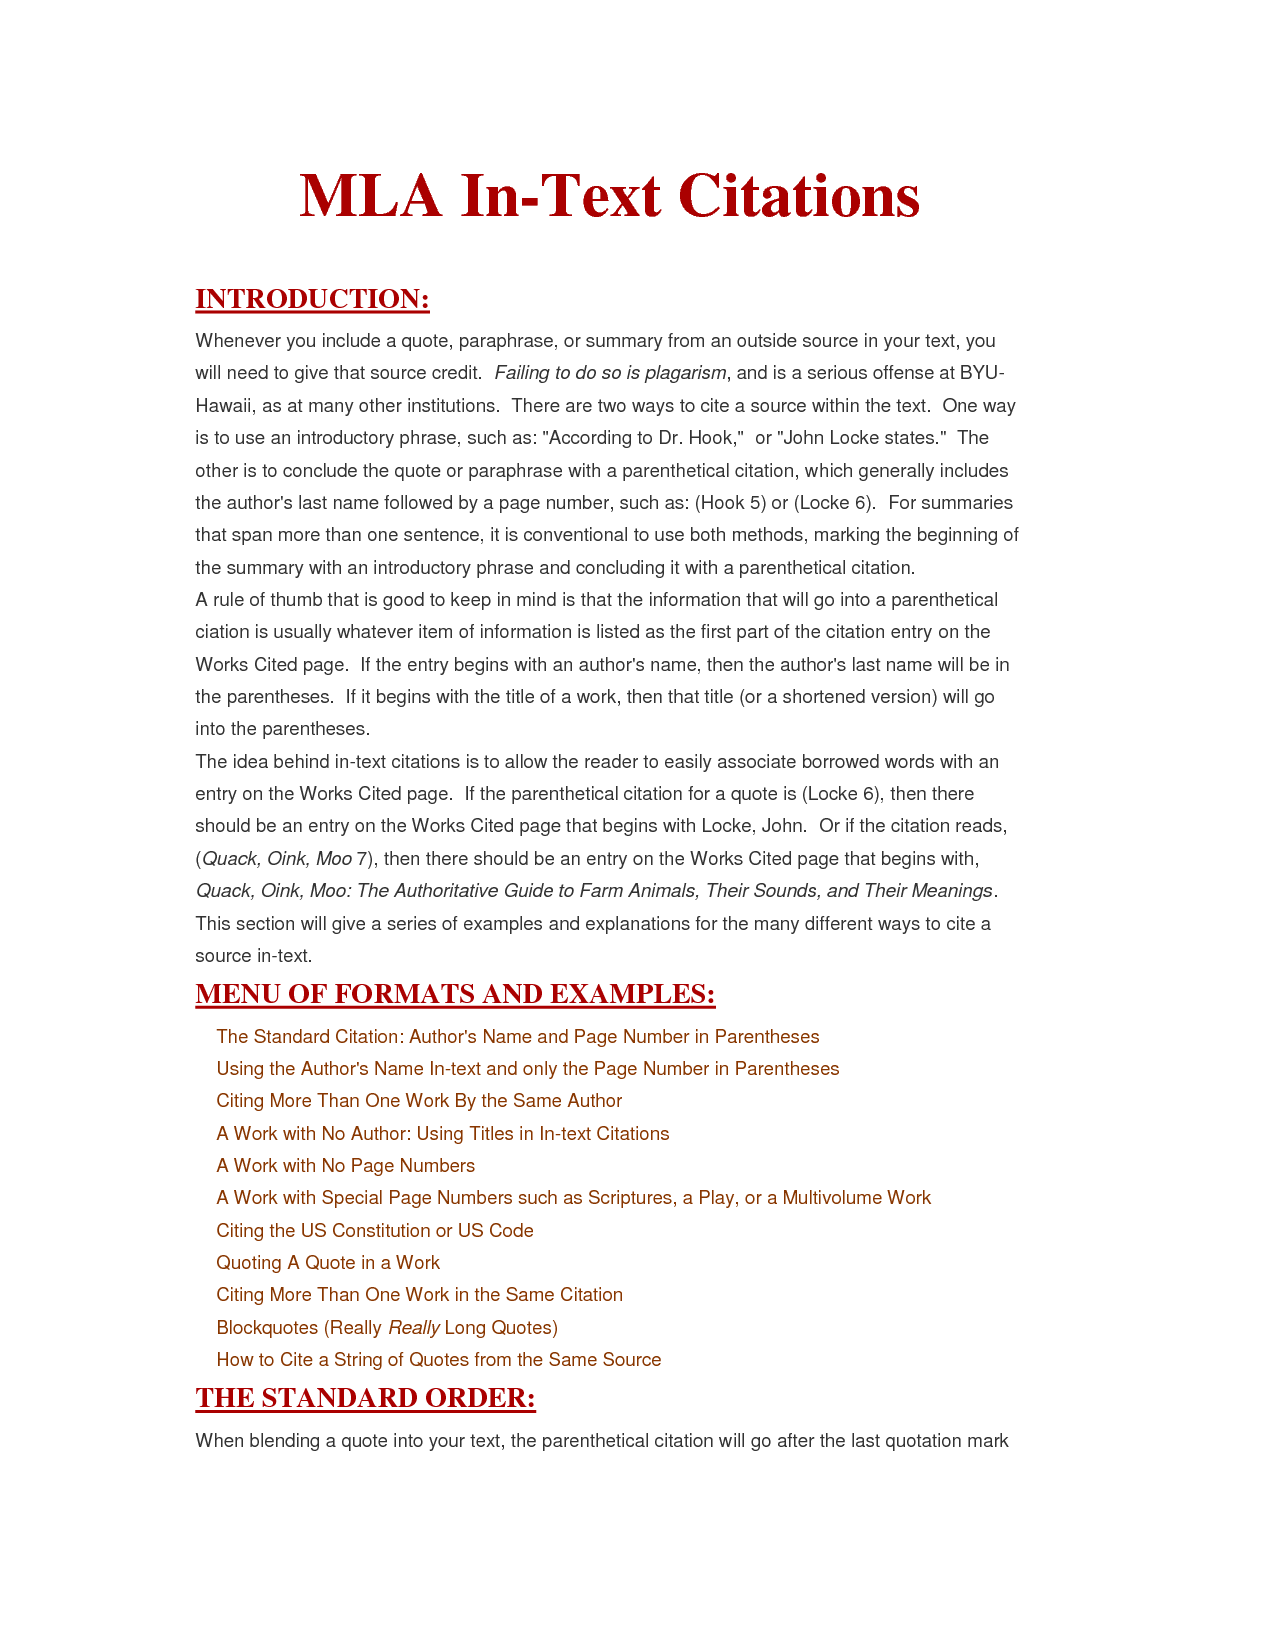 006 Mla Essay Citation Example Format Mersn Proforum Co Examples In Essays Fantastic Cite Within Book Full